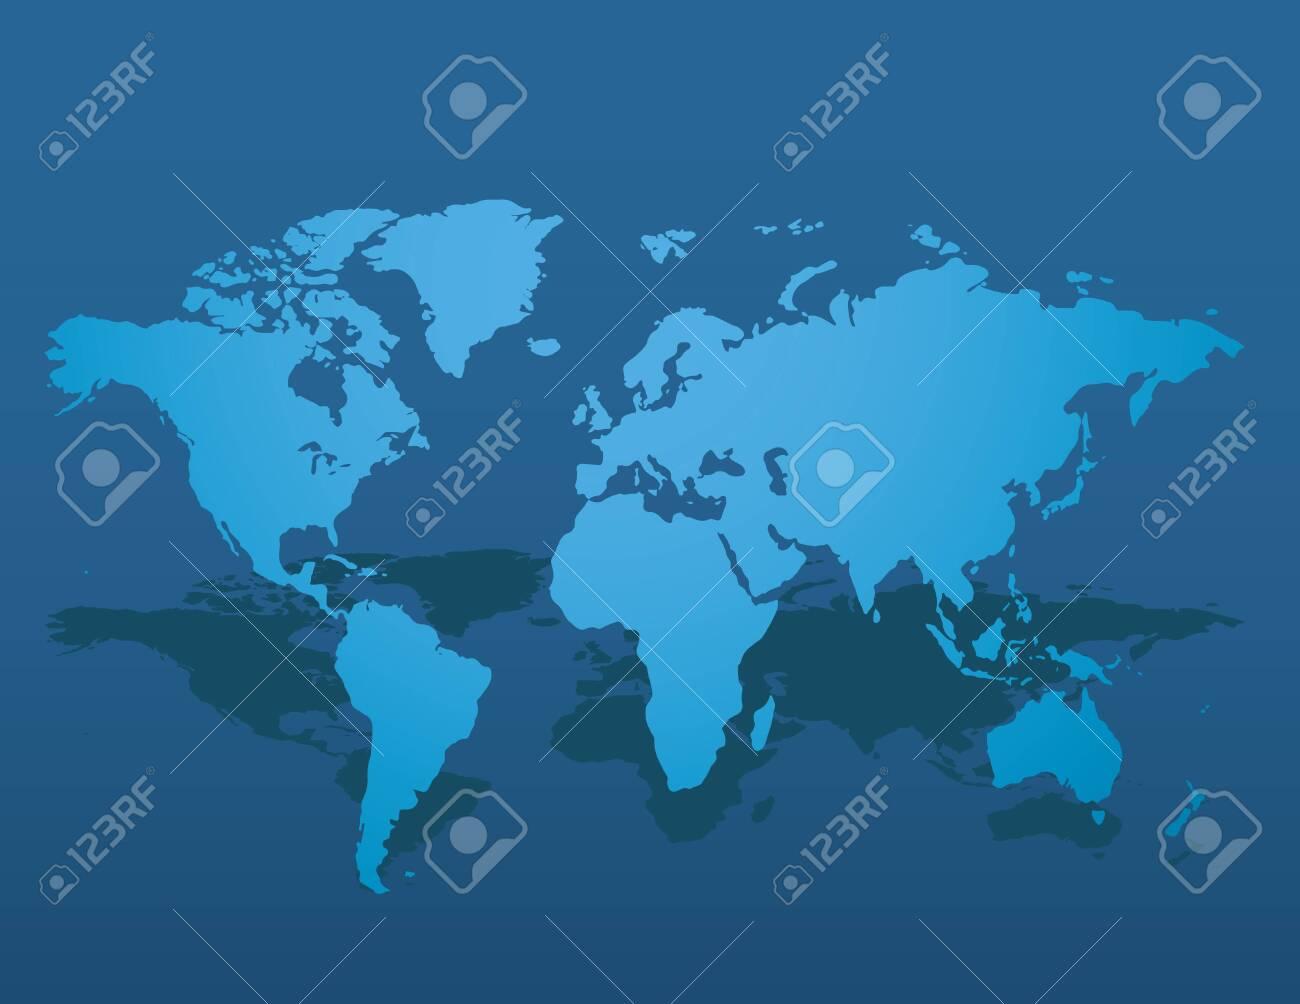 Blue similar world map blank on dark background for infographic. Vector illustration - 145232970